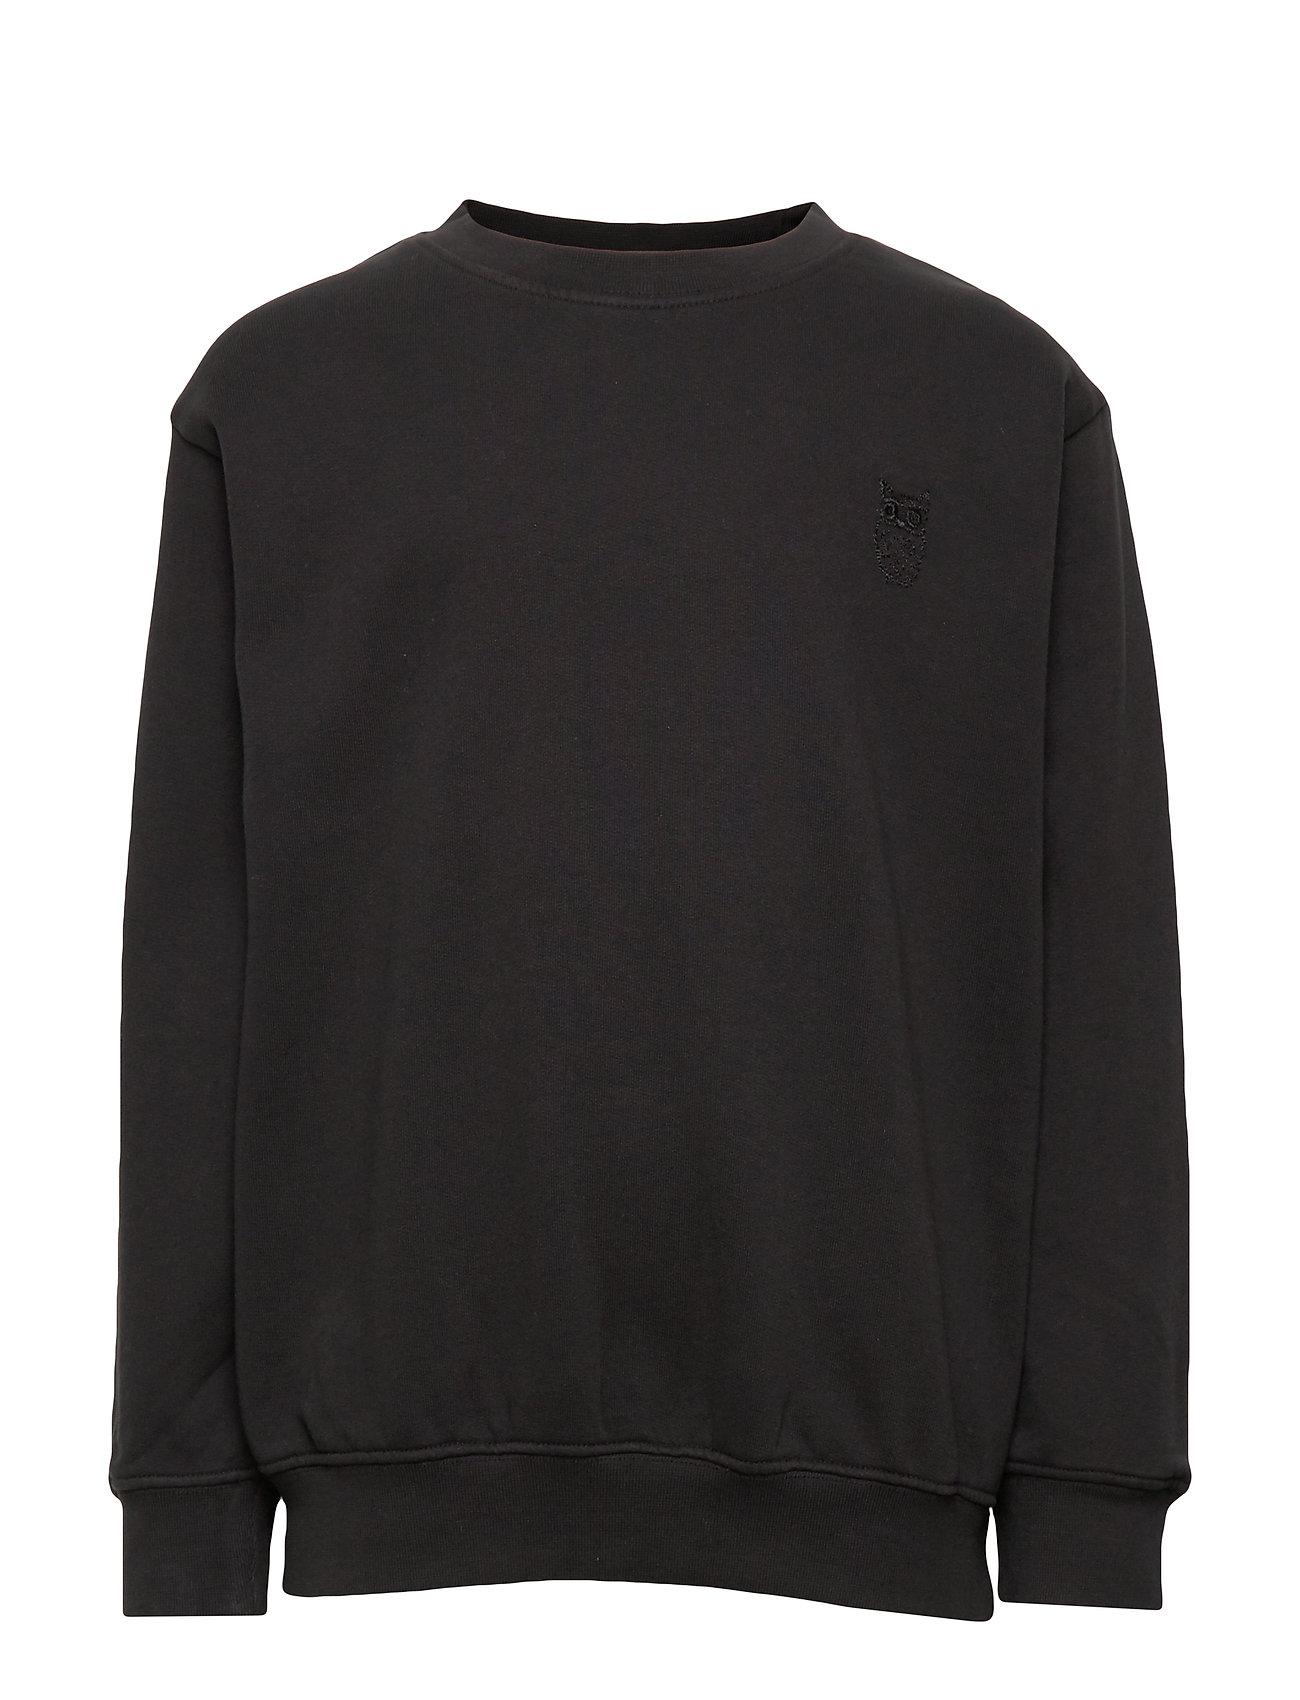 Soft Gallery Walker Sweatshirt - PHANTOM, MINI OWL EMB.